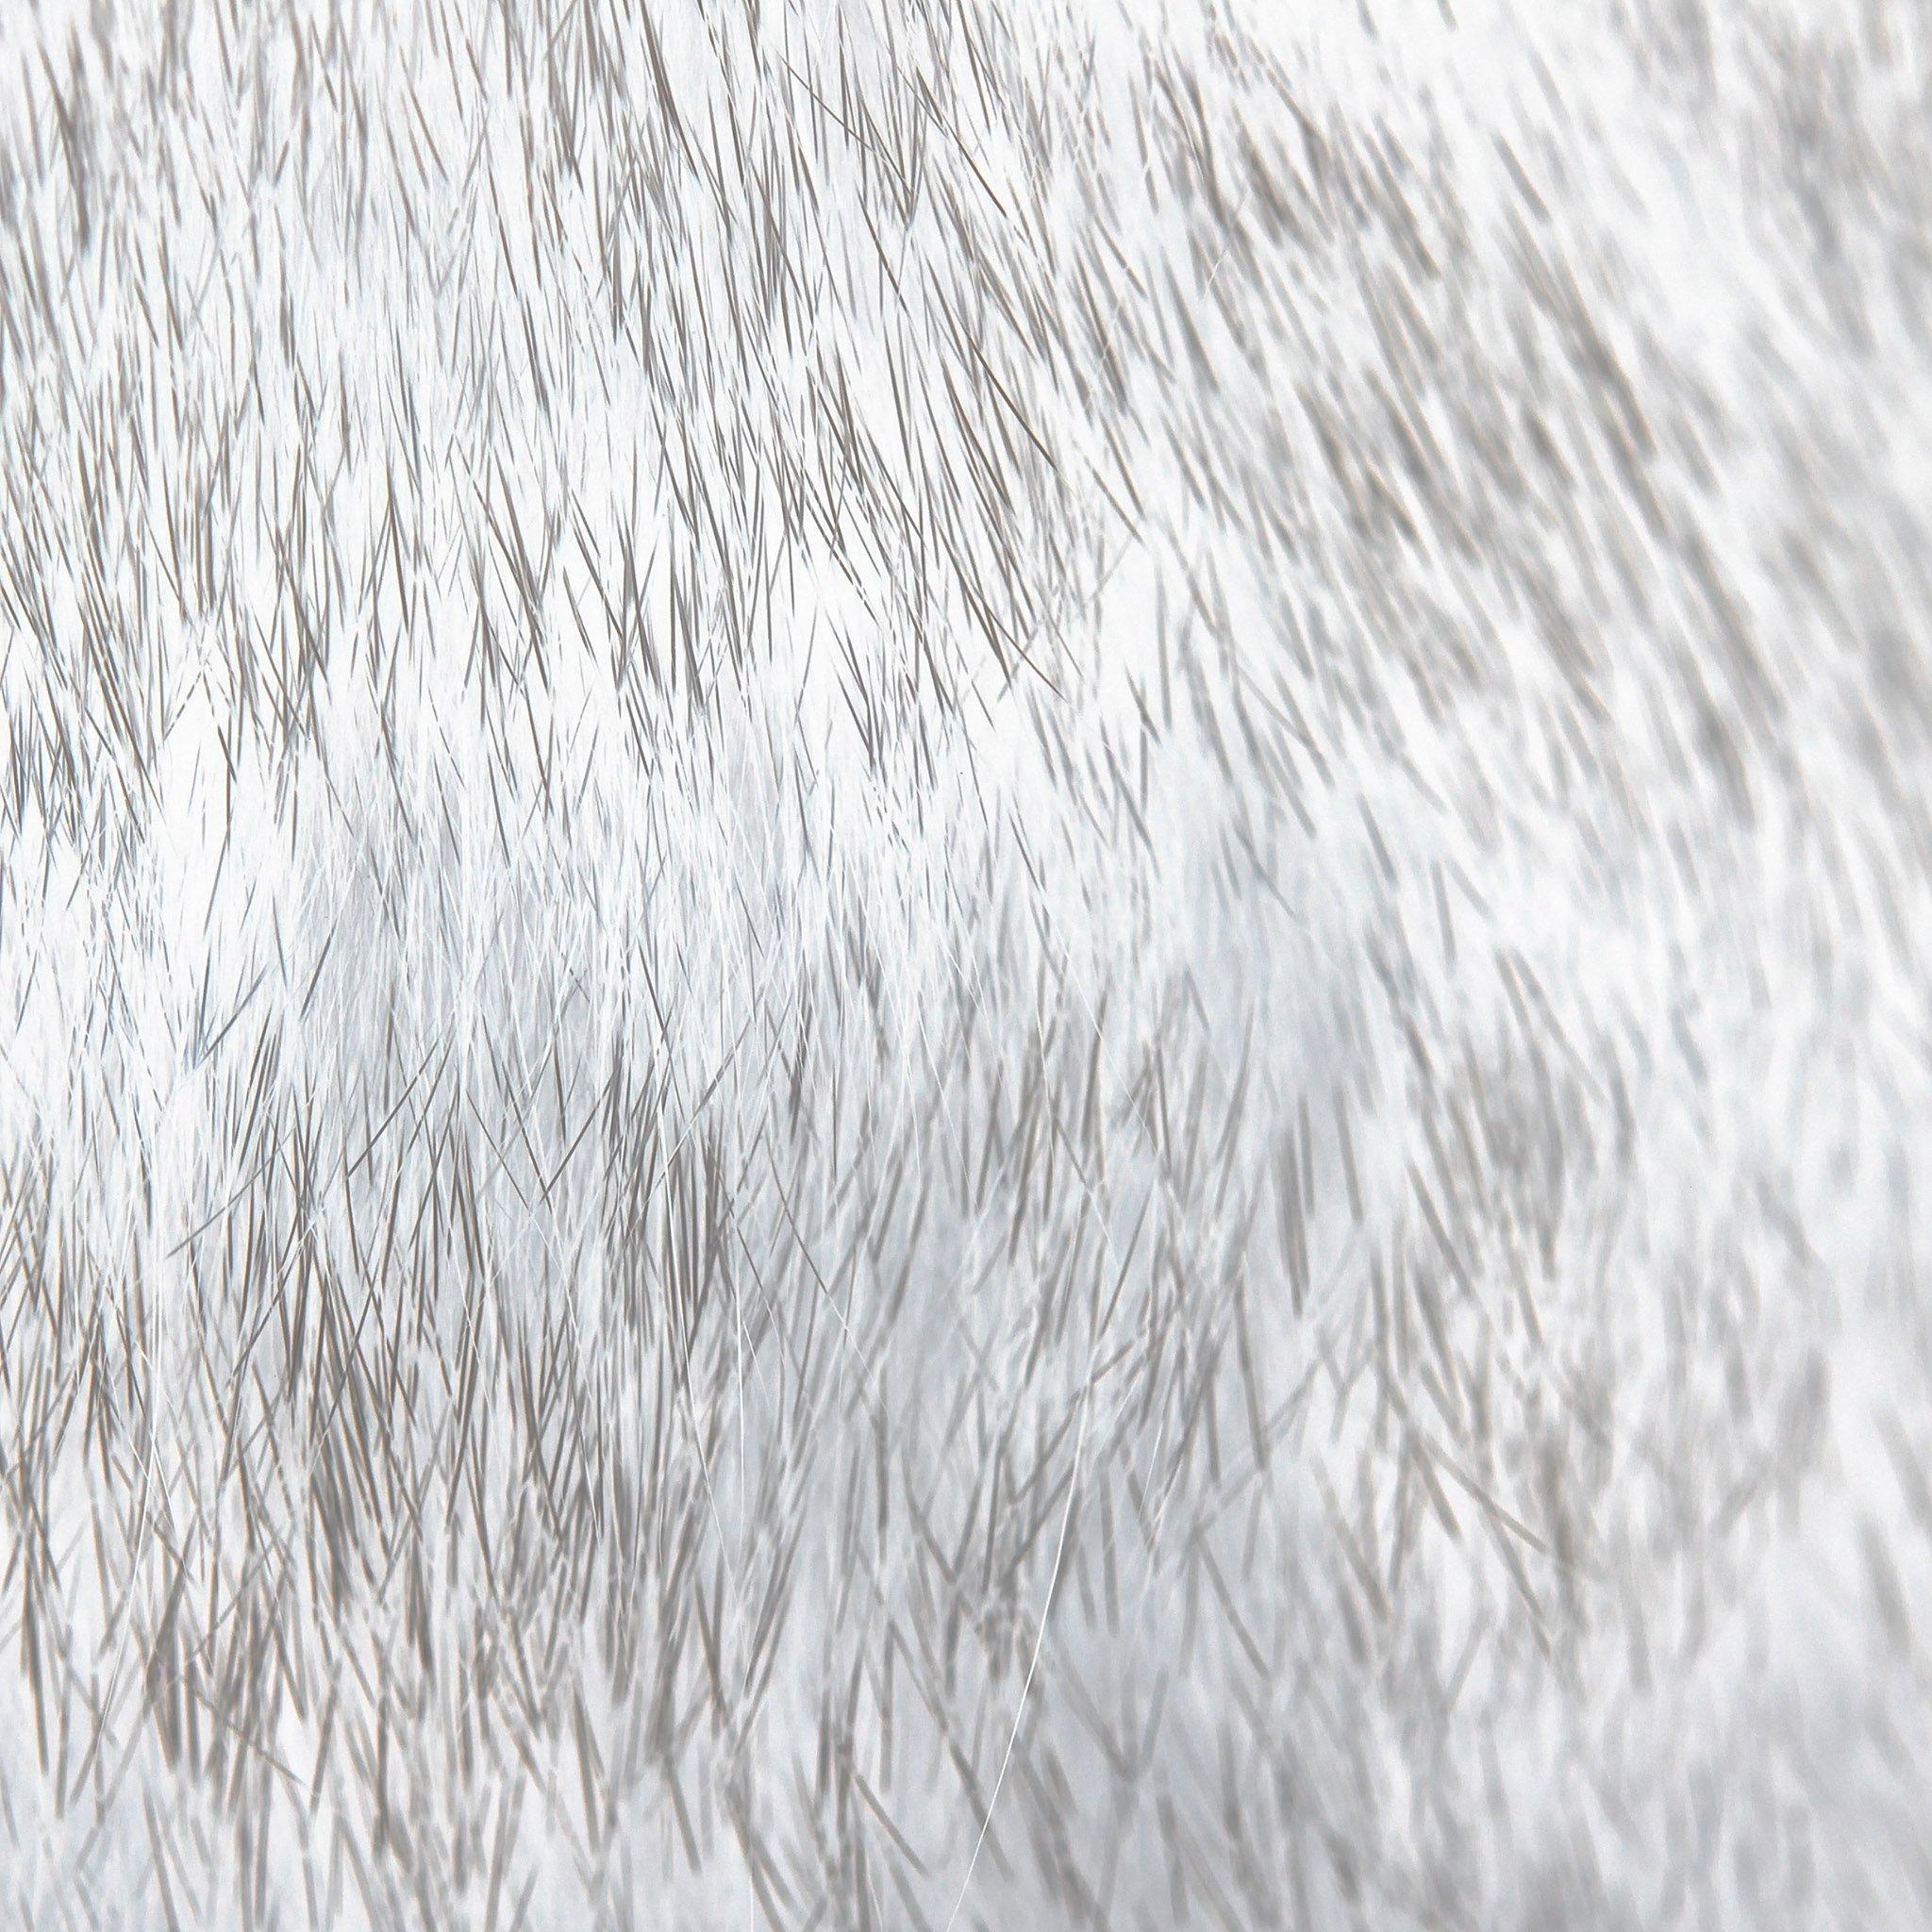 FREEIOS7 cat fur rawrdis white   parallax HD iPhone iPad wallpaper 2048x2048